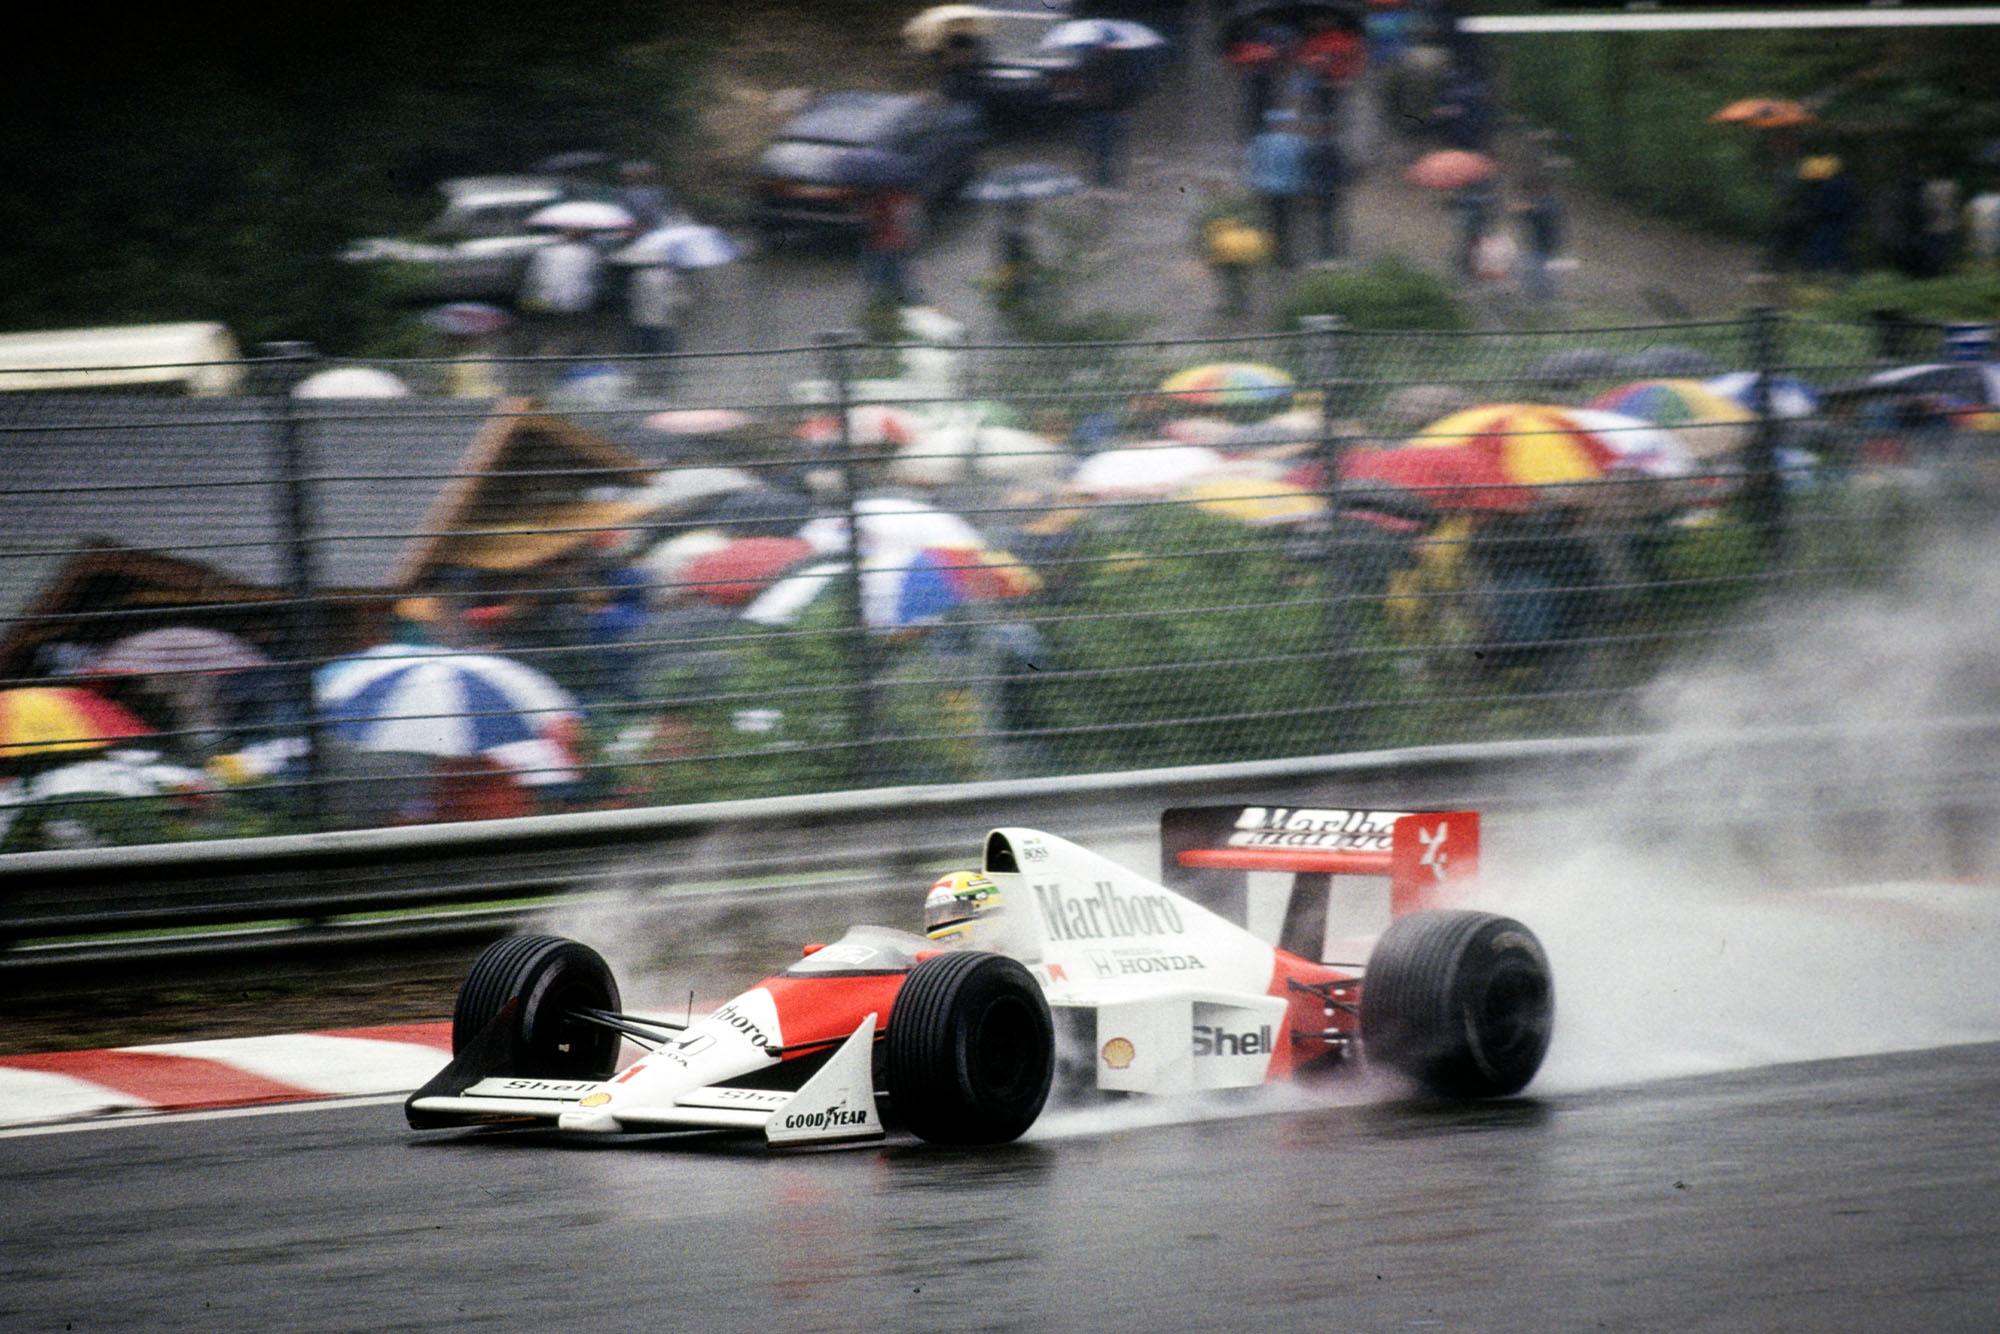 1989 BEL GP finish